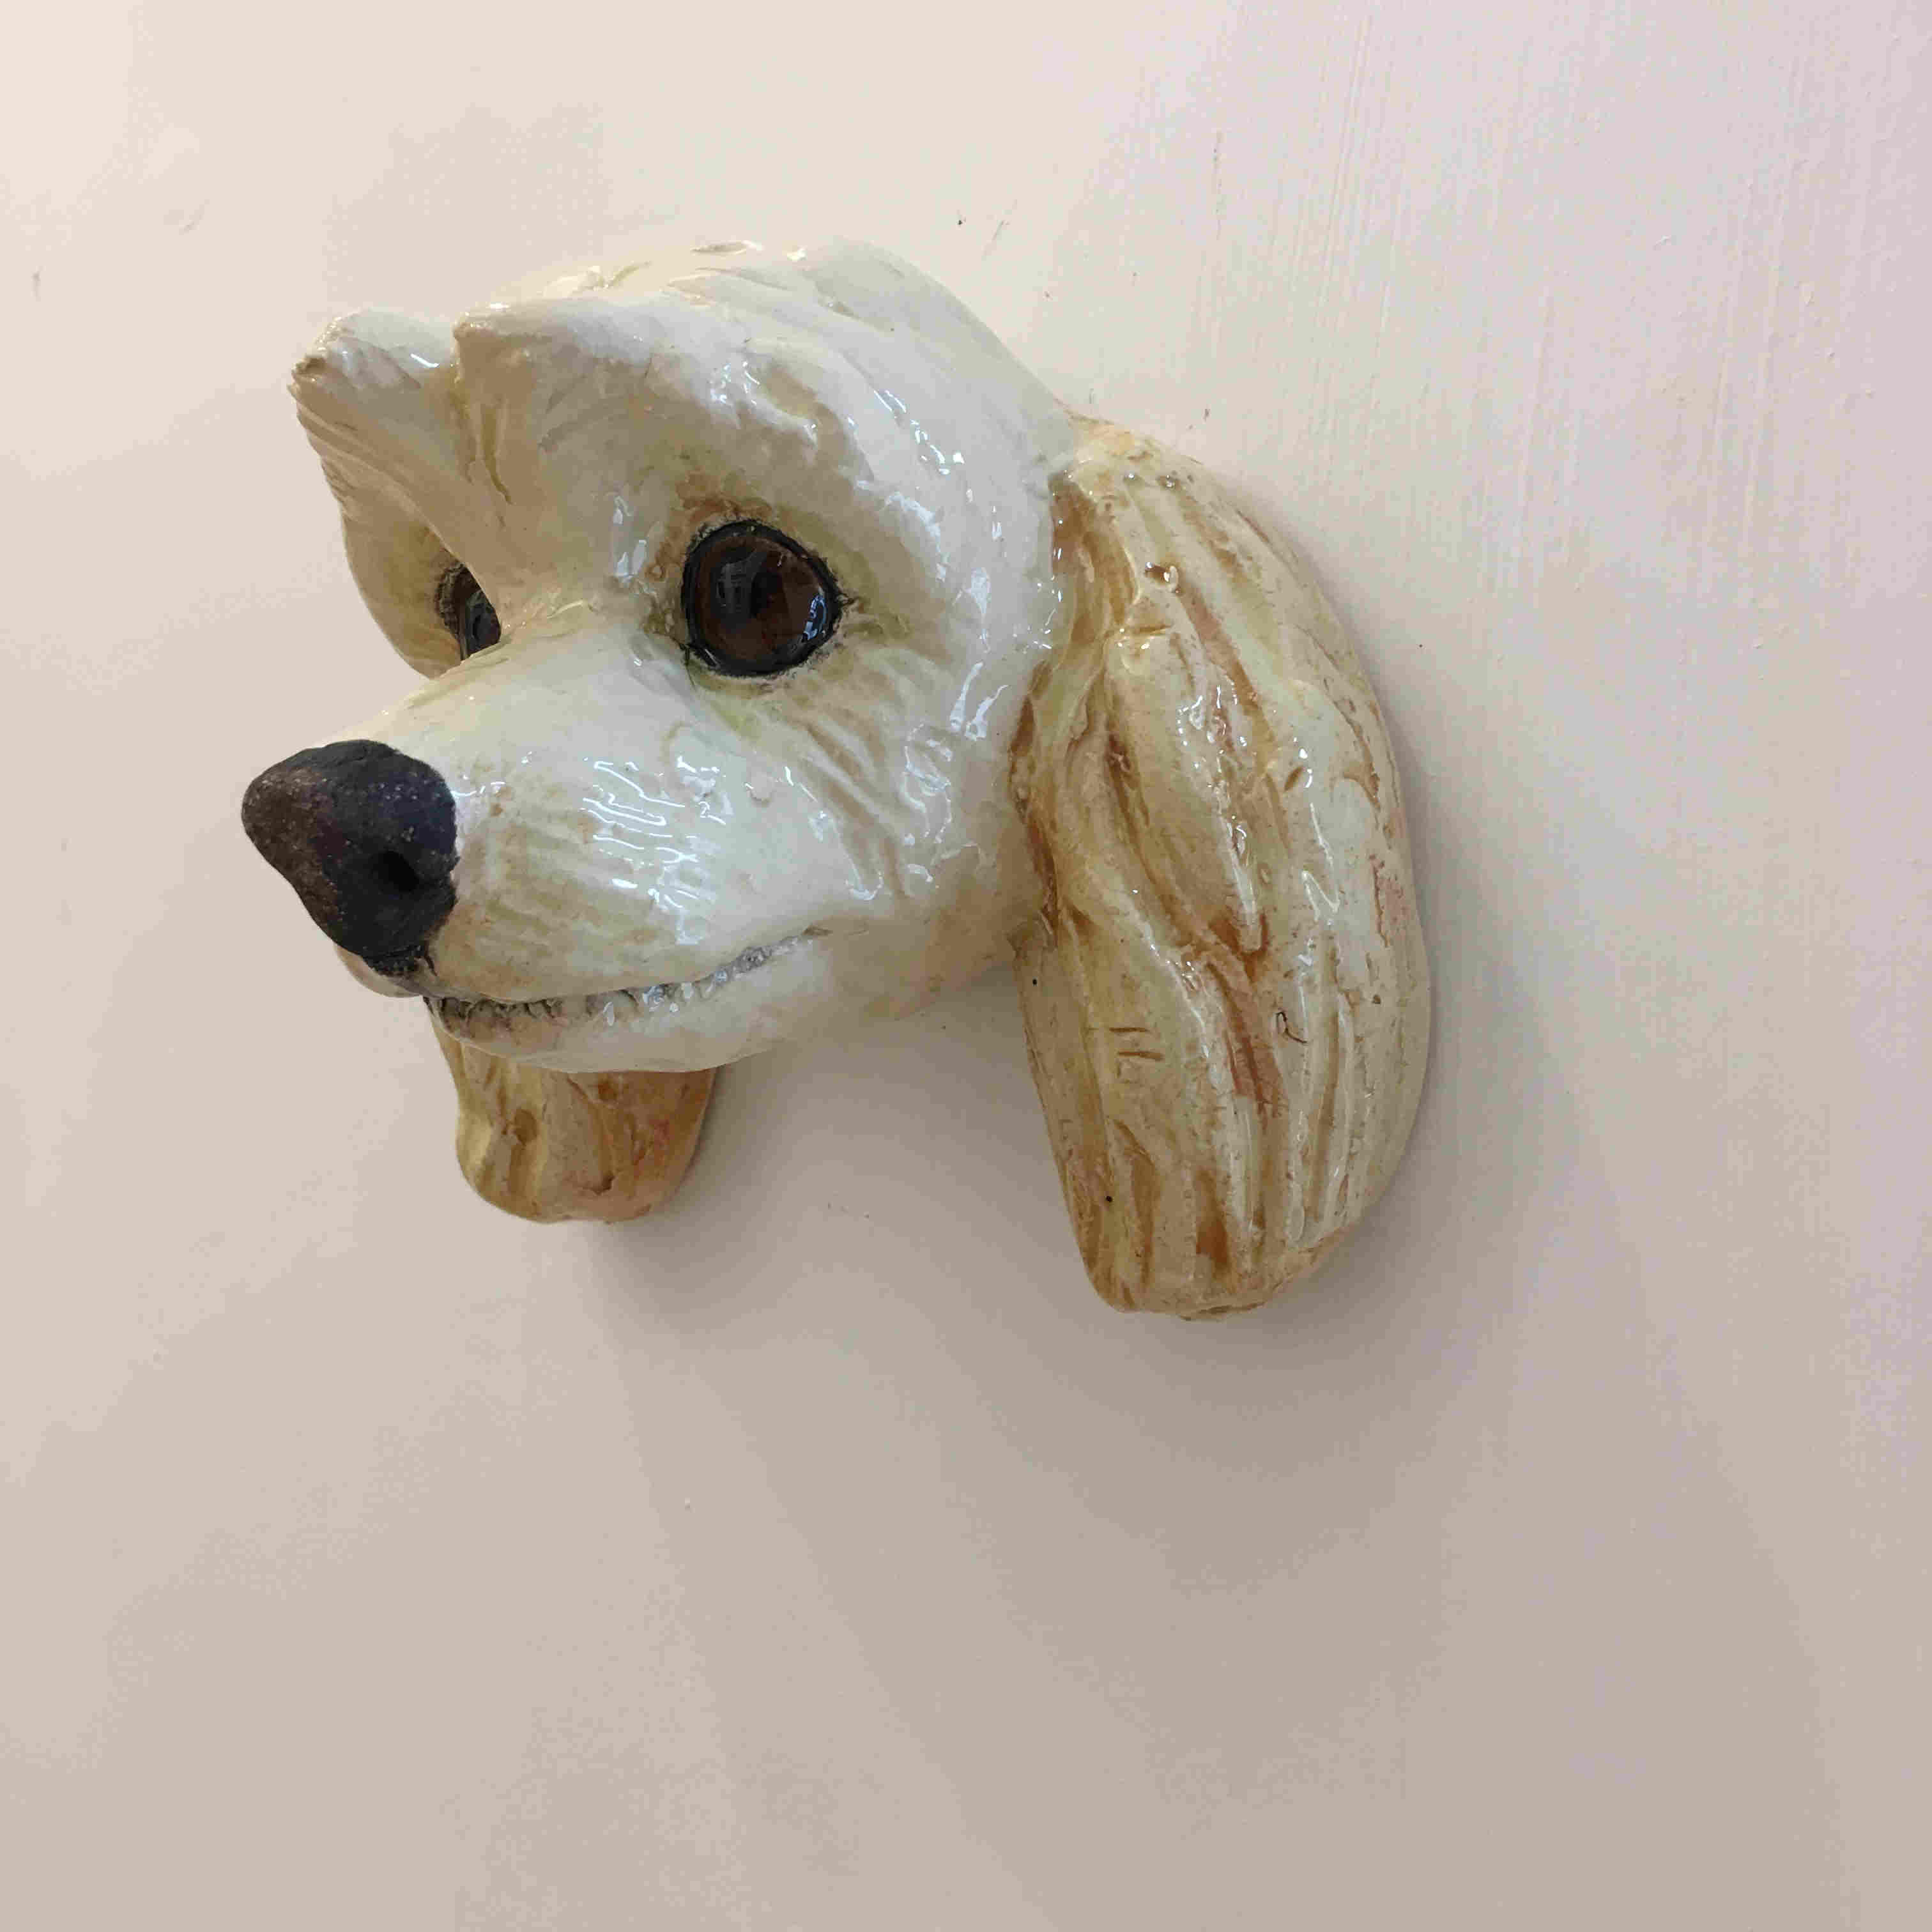 "'Miniature Poodle ""Hugo""' by artist Alex Johannsen"